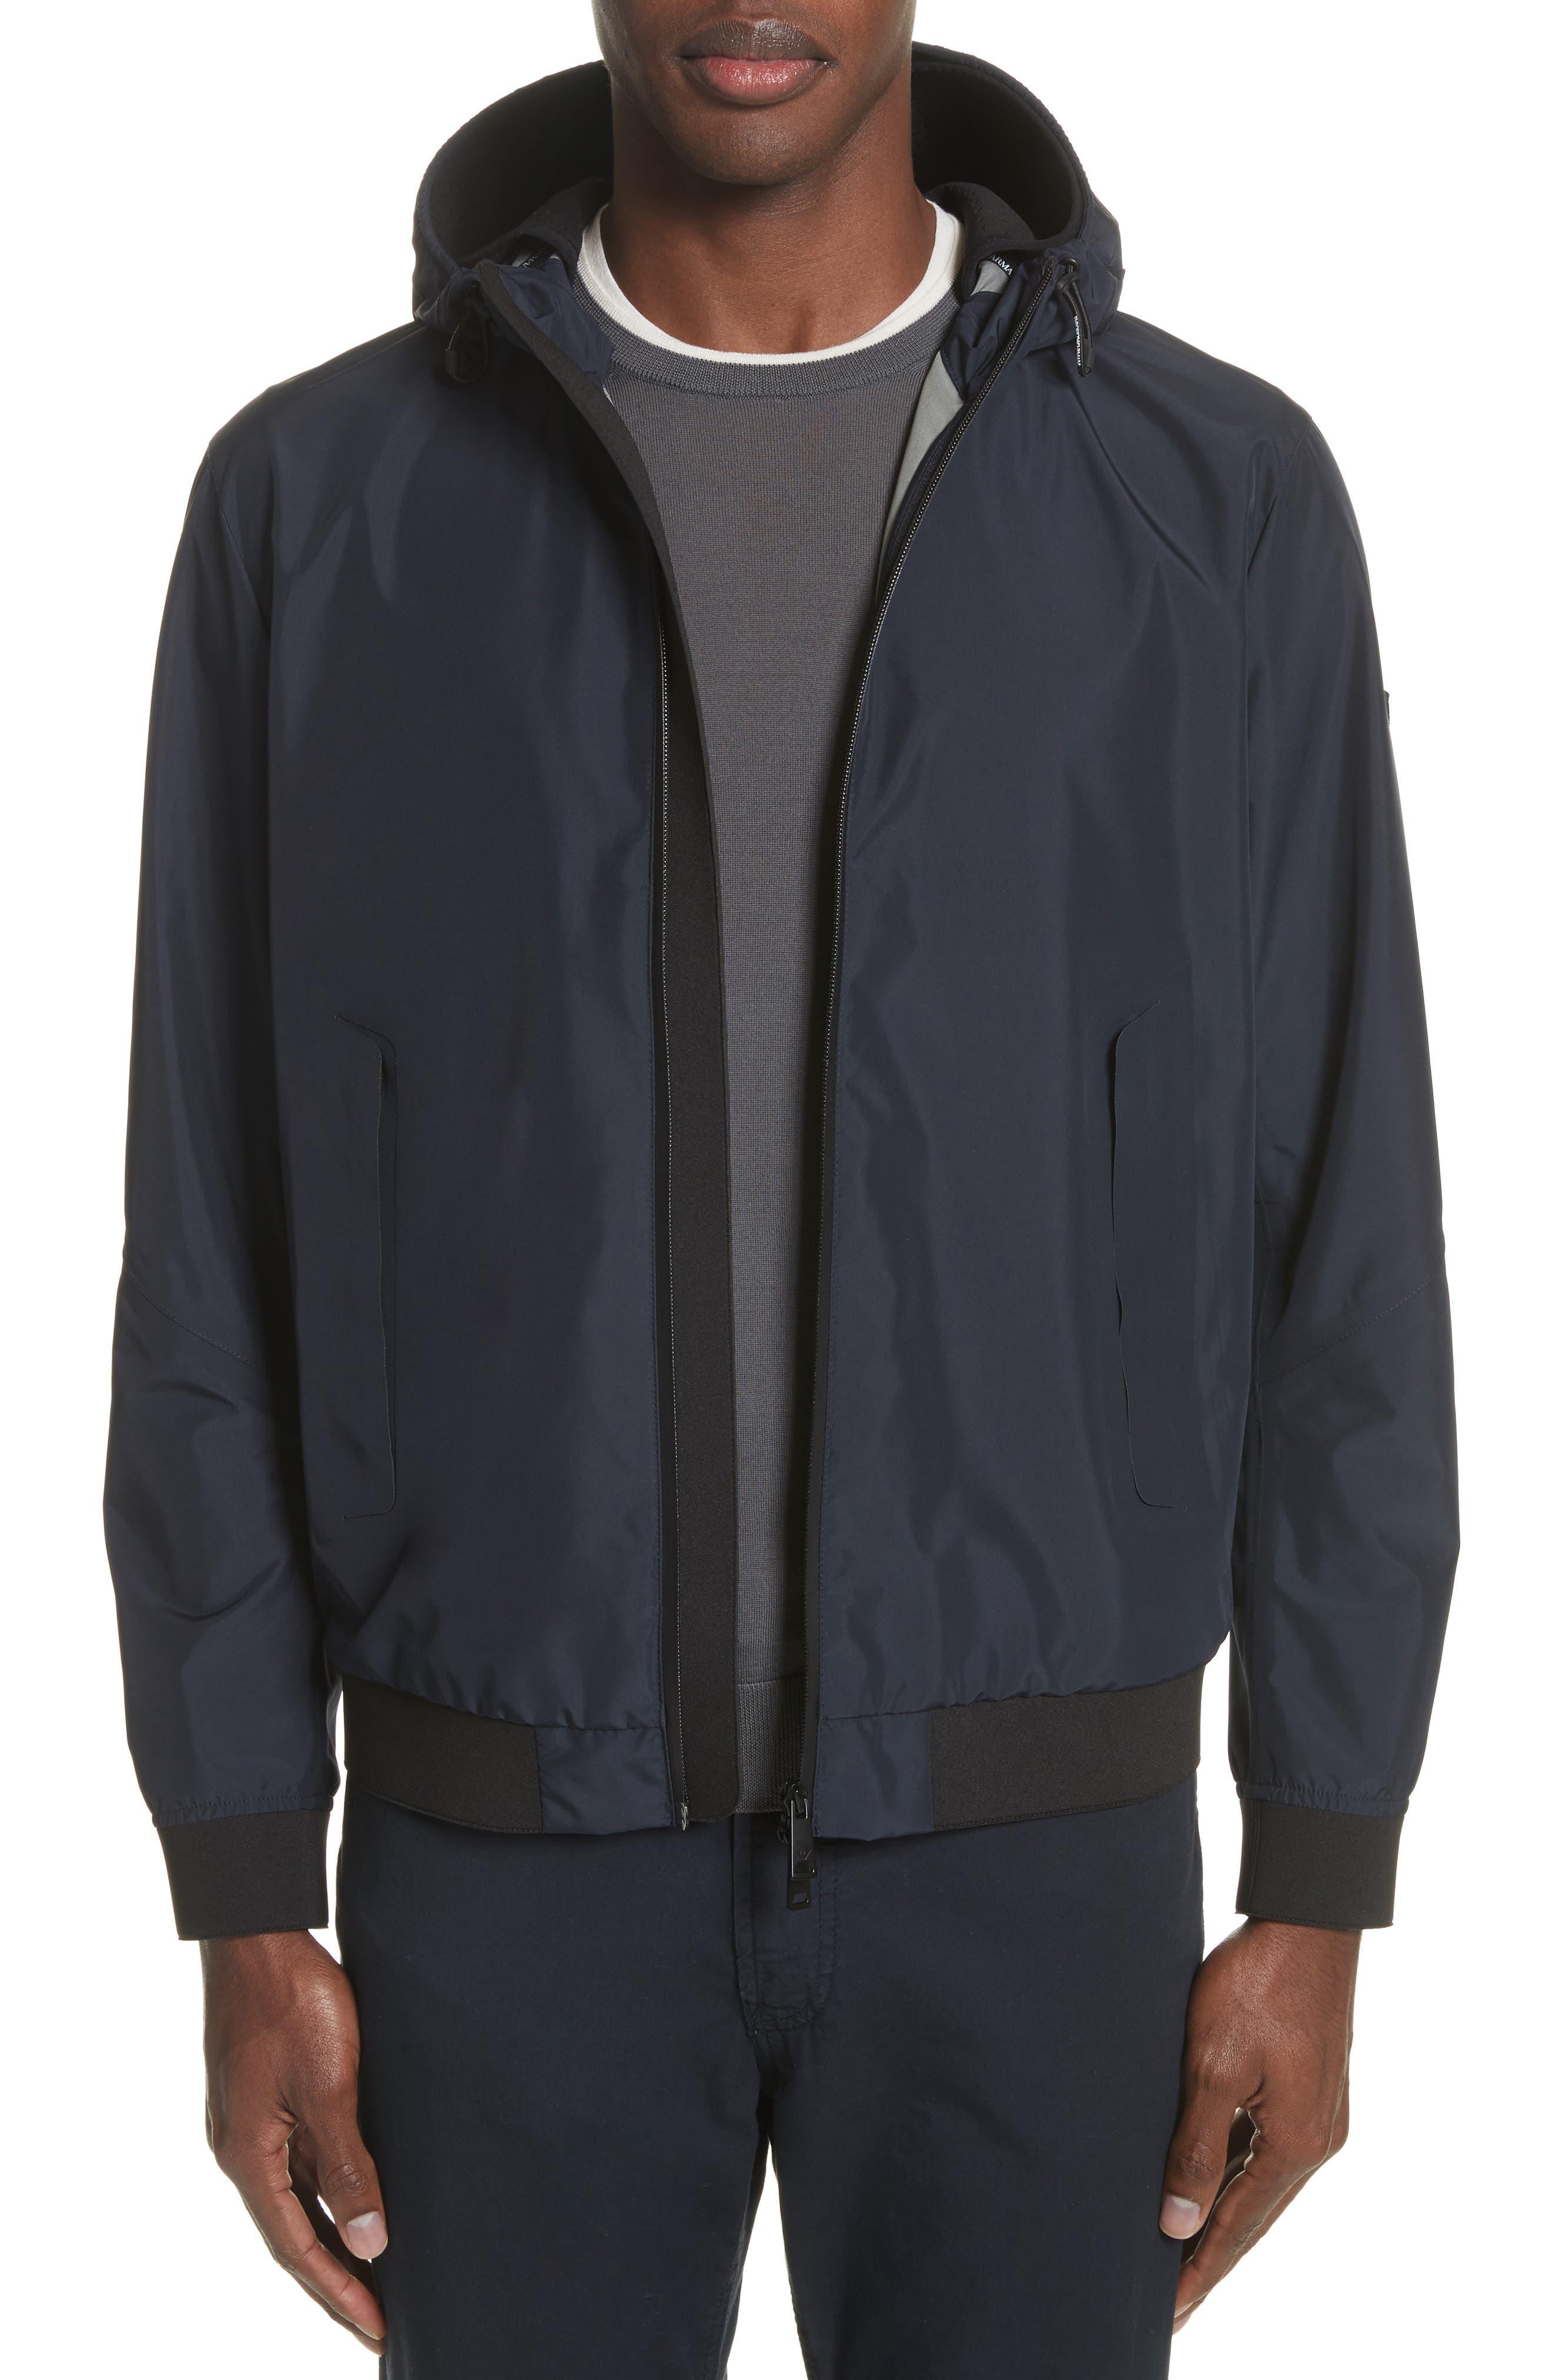 Emporio Armani Regular Fit Hooded Jacket